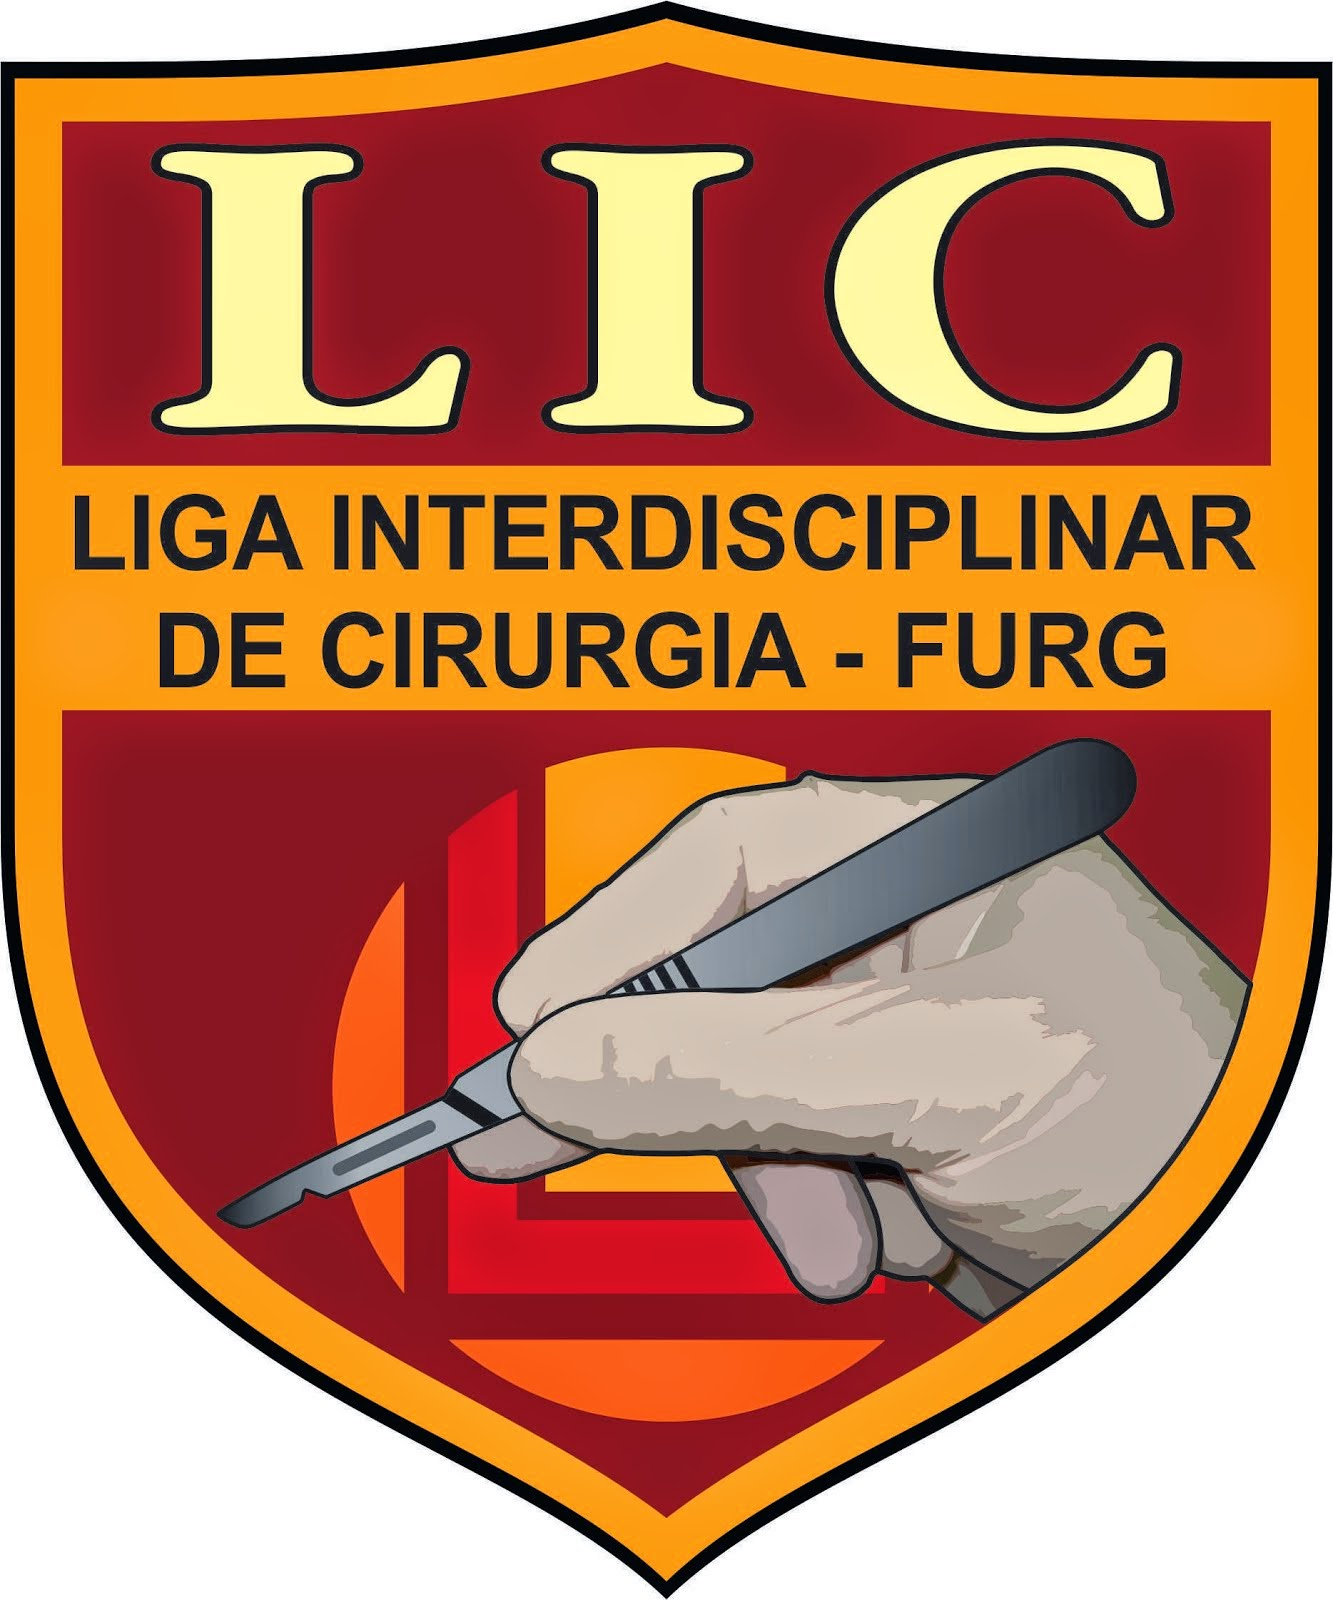 Ligas______ e _____ Blogs ______Parceiros:  Liga Interdisciplinar de Cirurgia